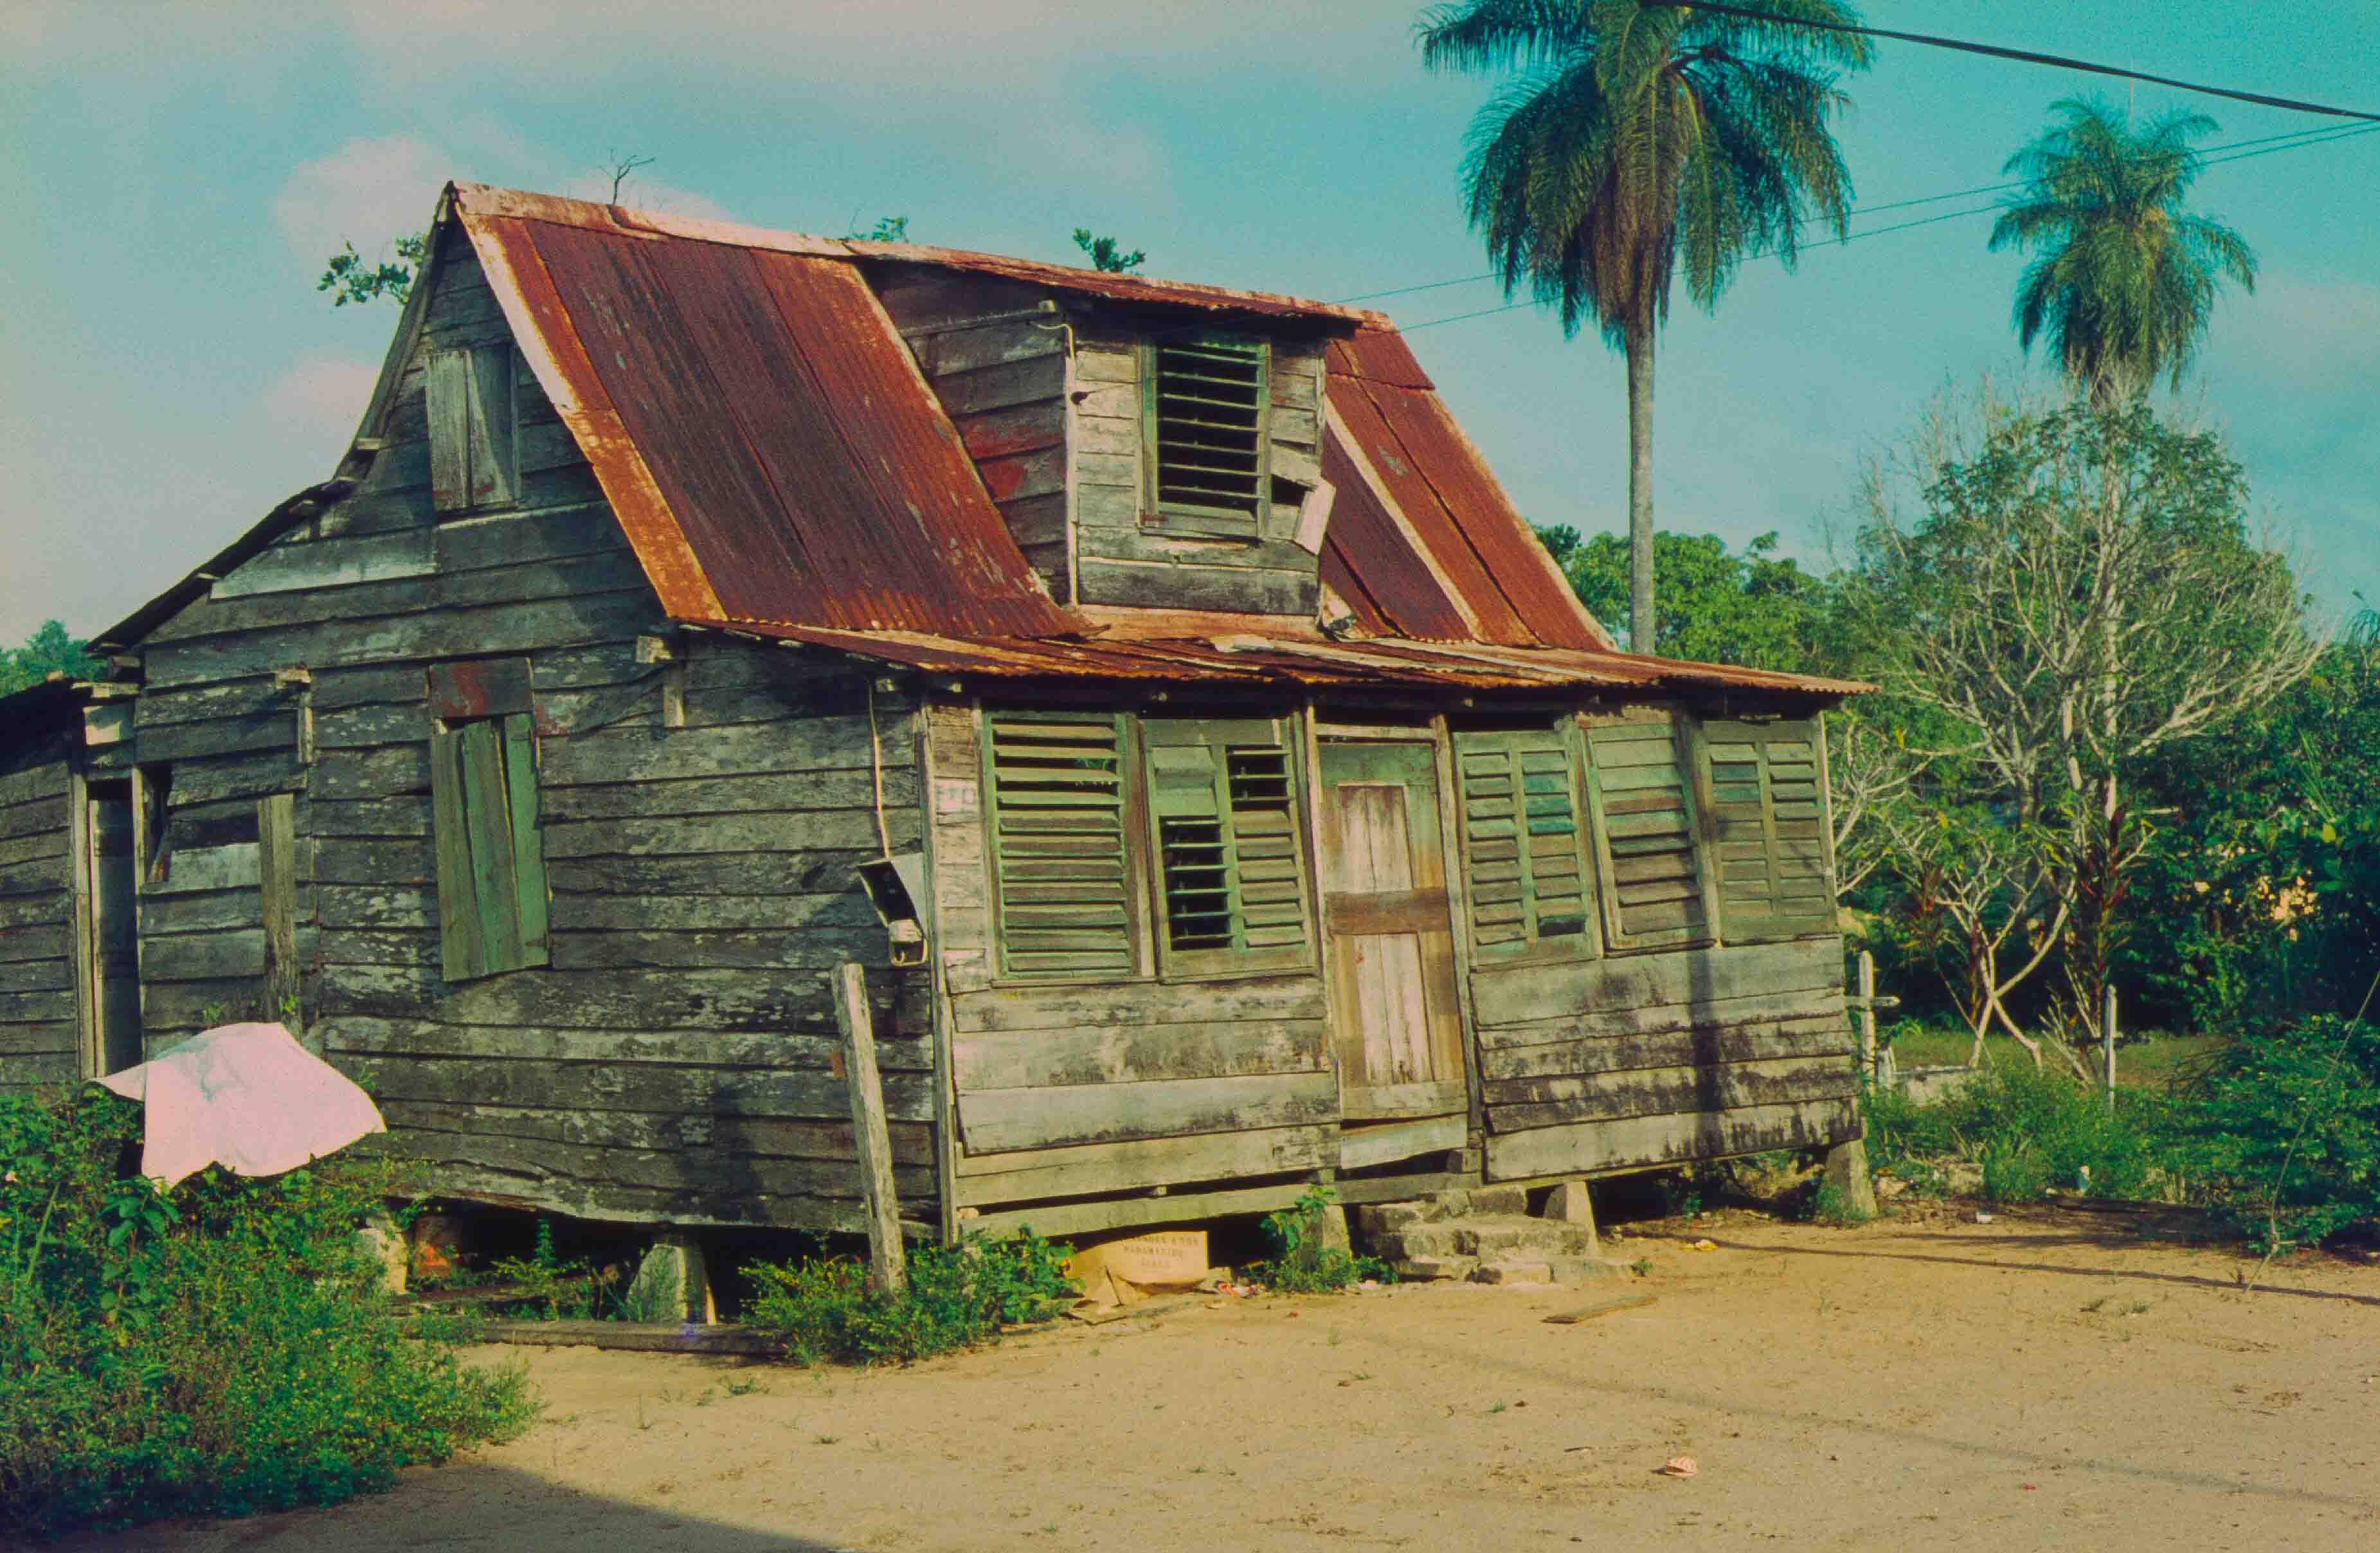 385. Suriname